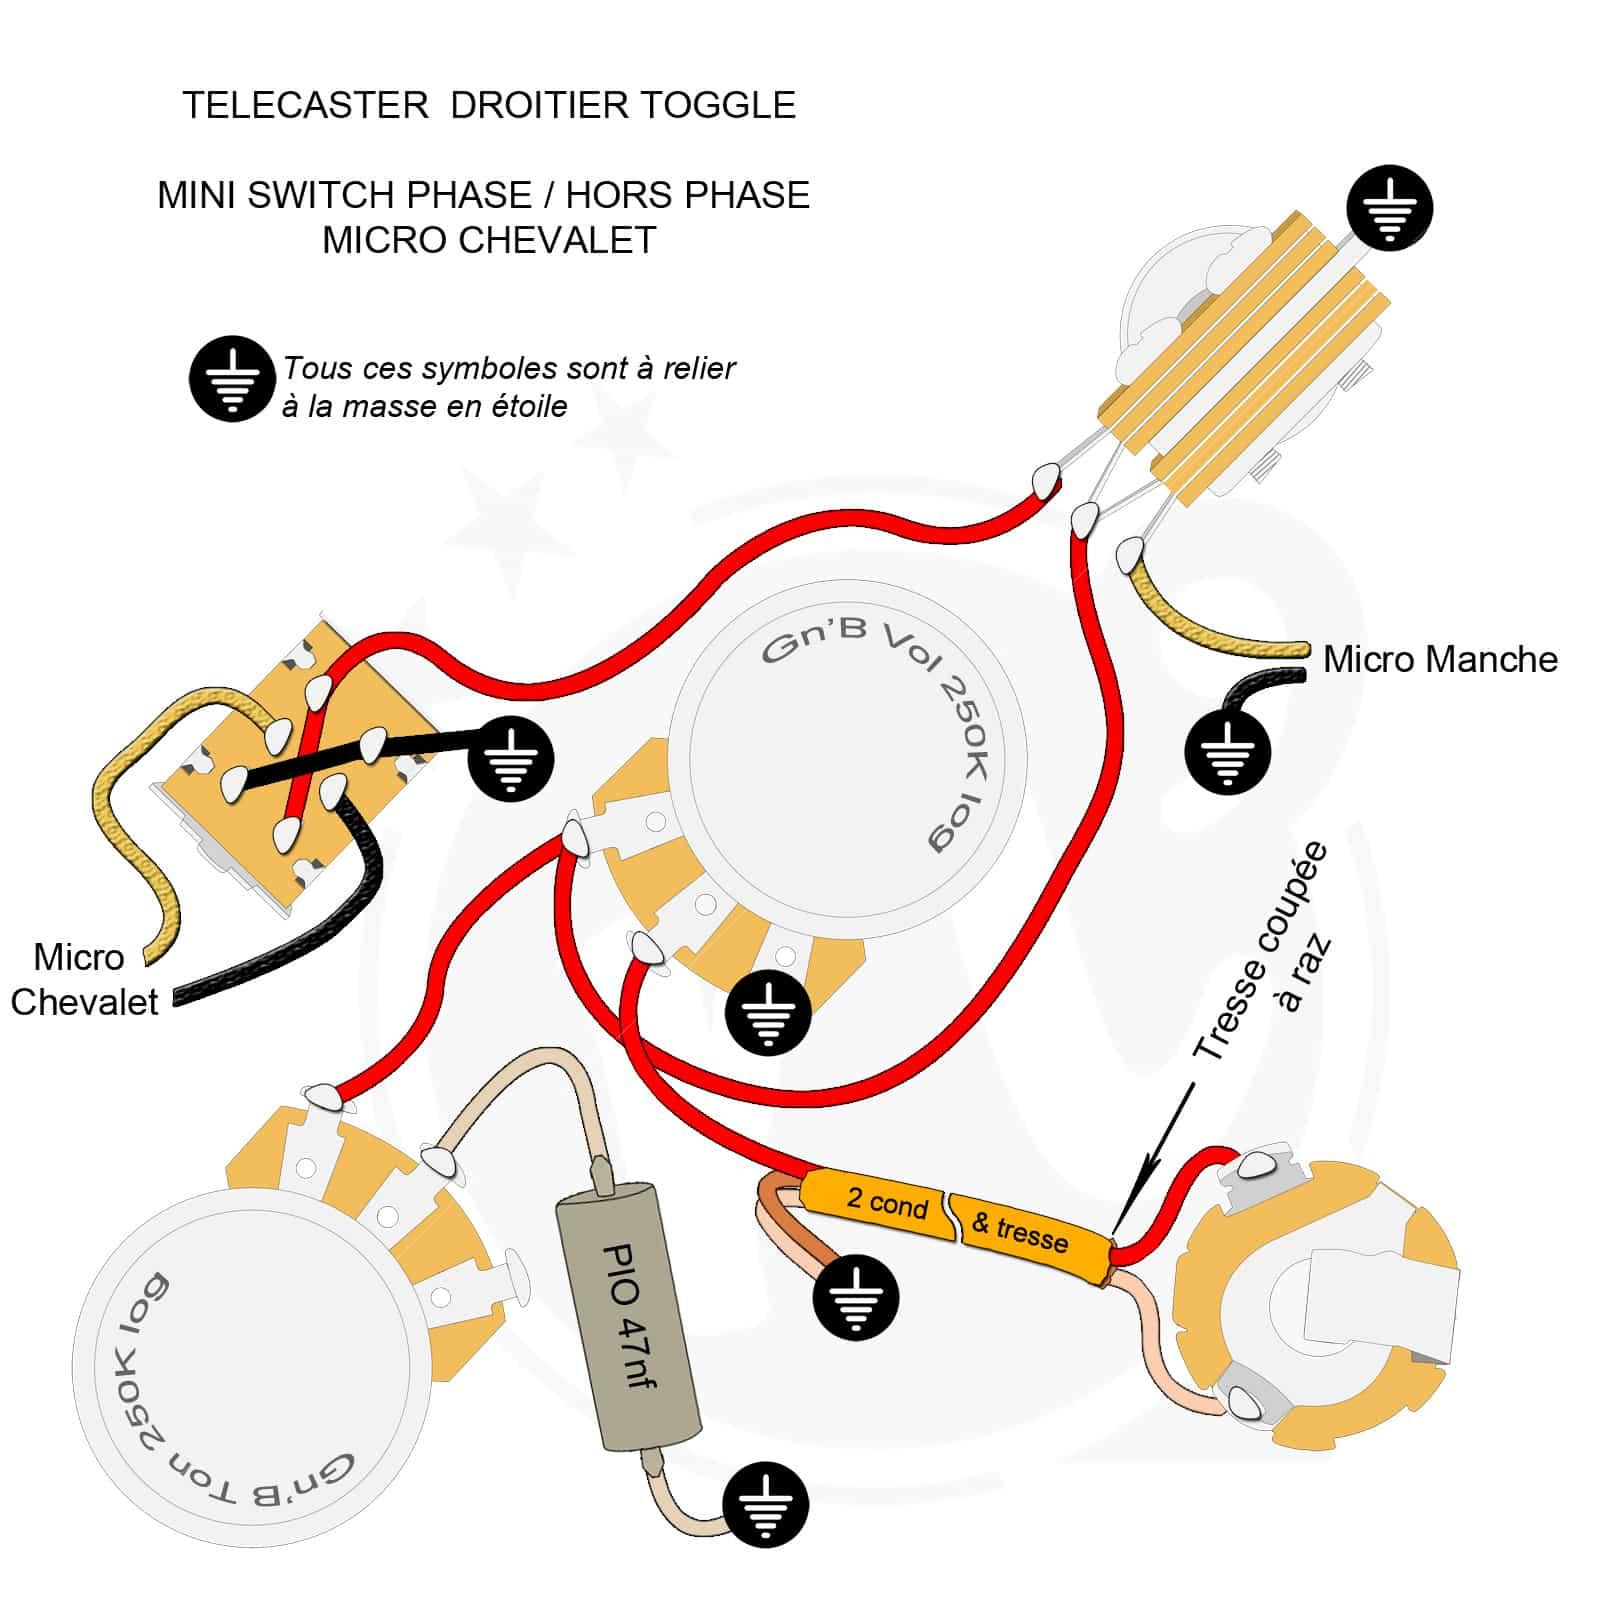 TELE-DROITIER-TOGGLE-SPLIT-PHASE